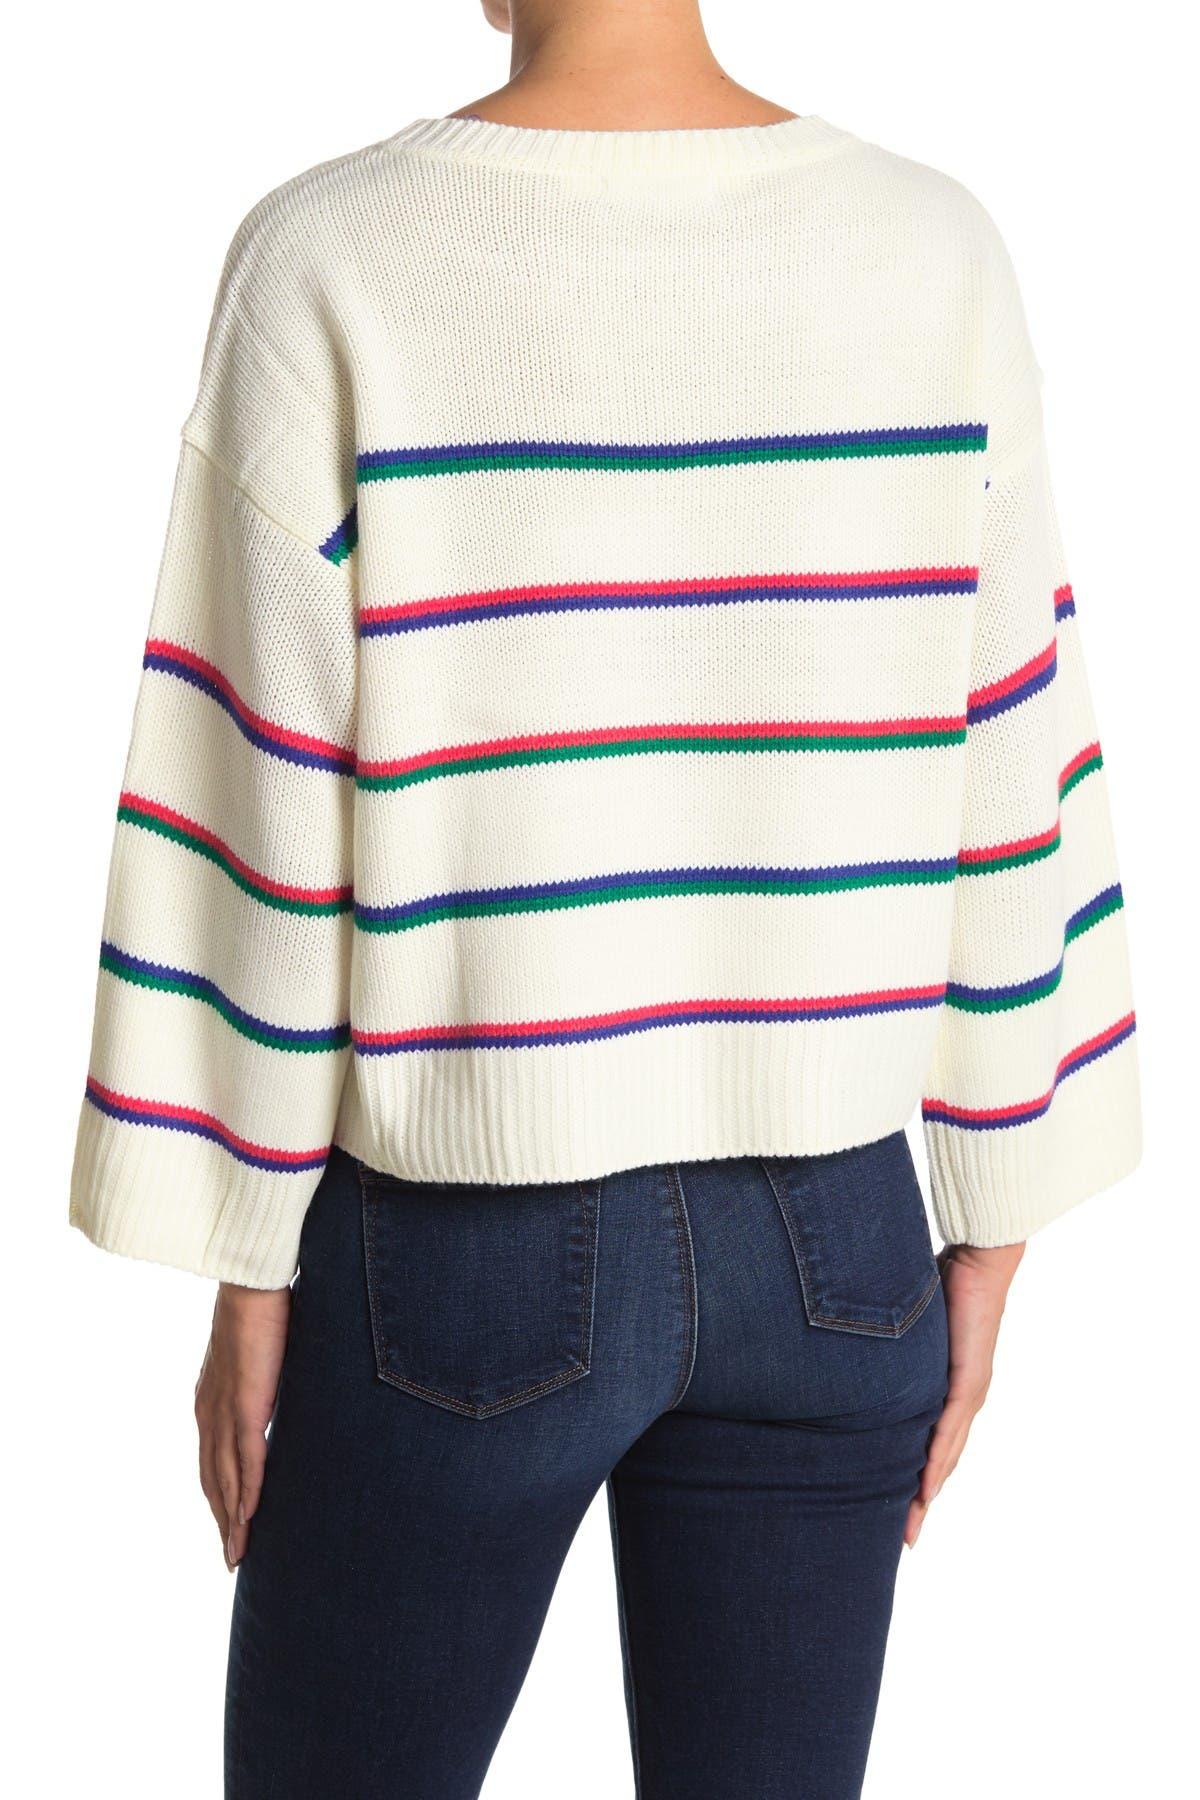 Image of BB Dakota Stripe Hype Sweater